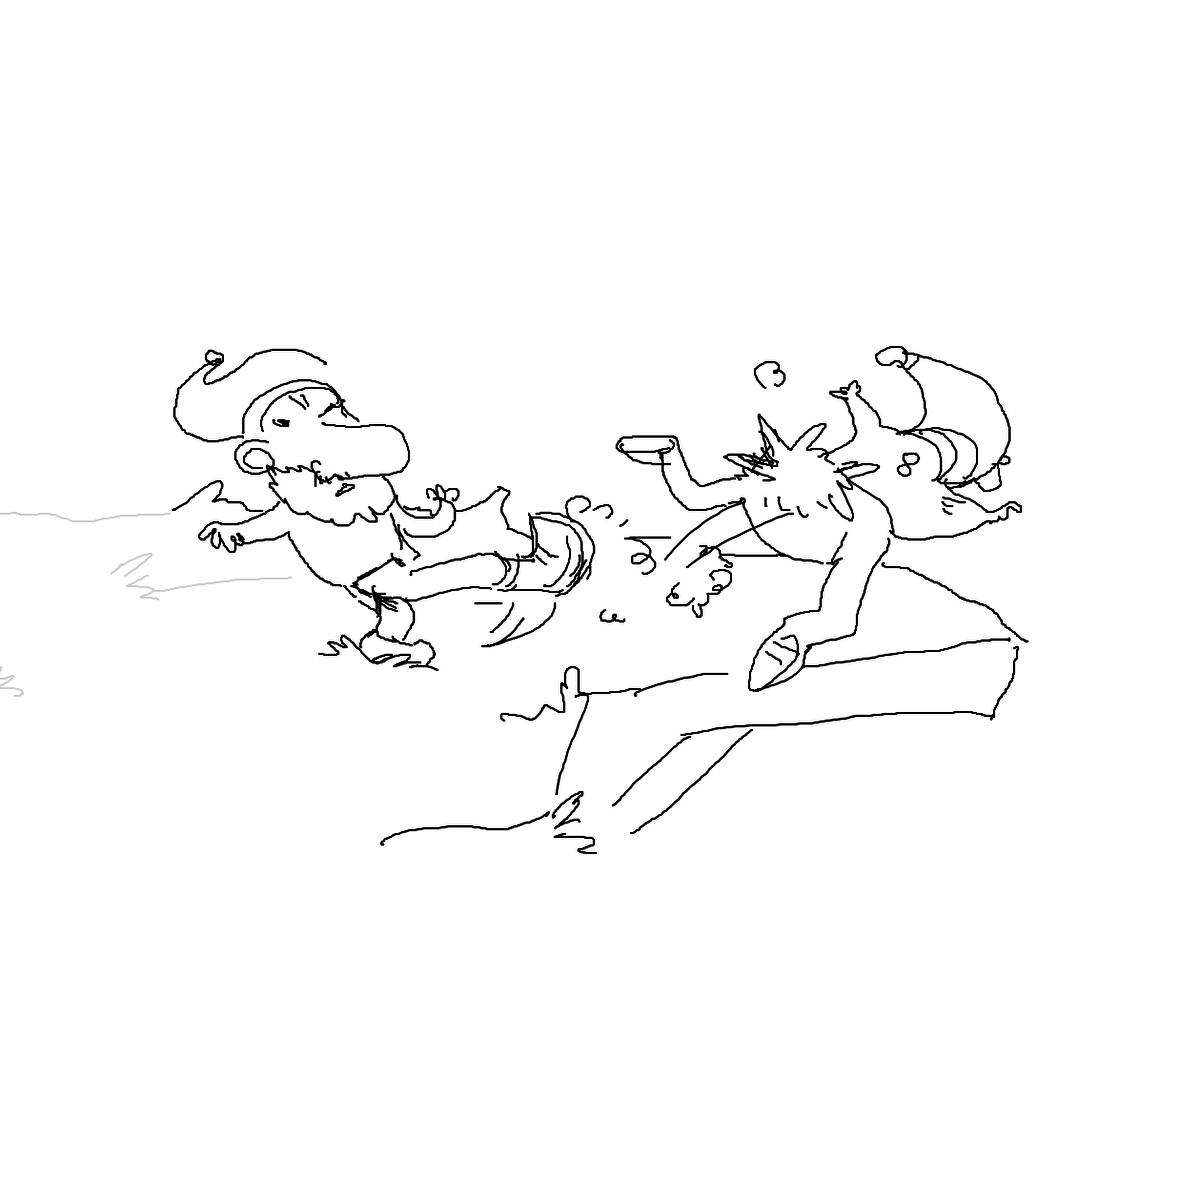 BAAAM drawing#22097 lat:78.4175872802734400lng: -4.4400739669799805